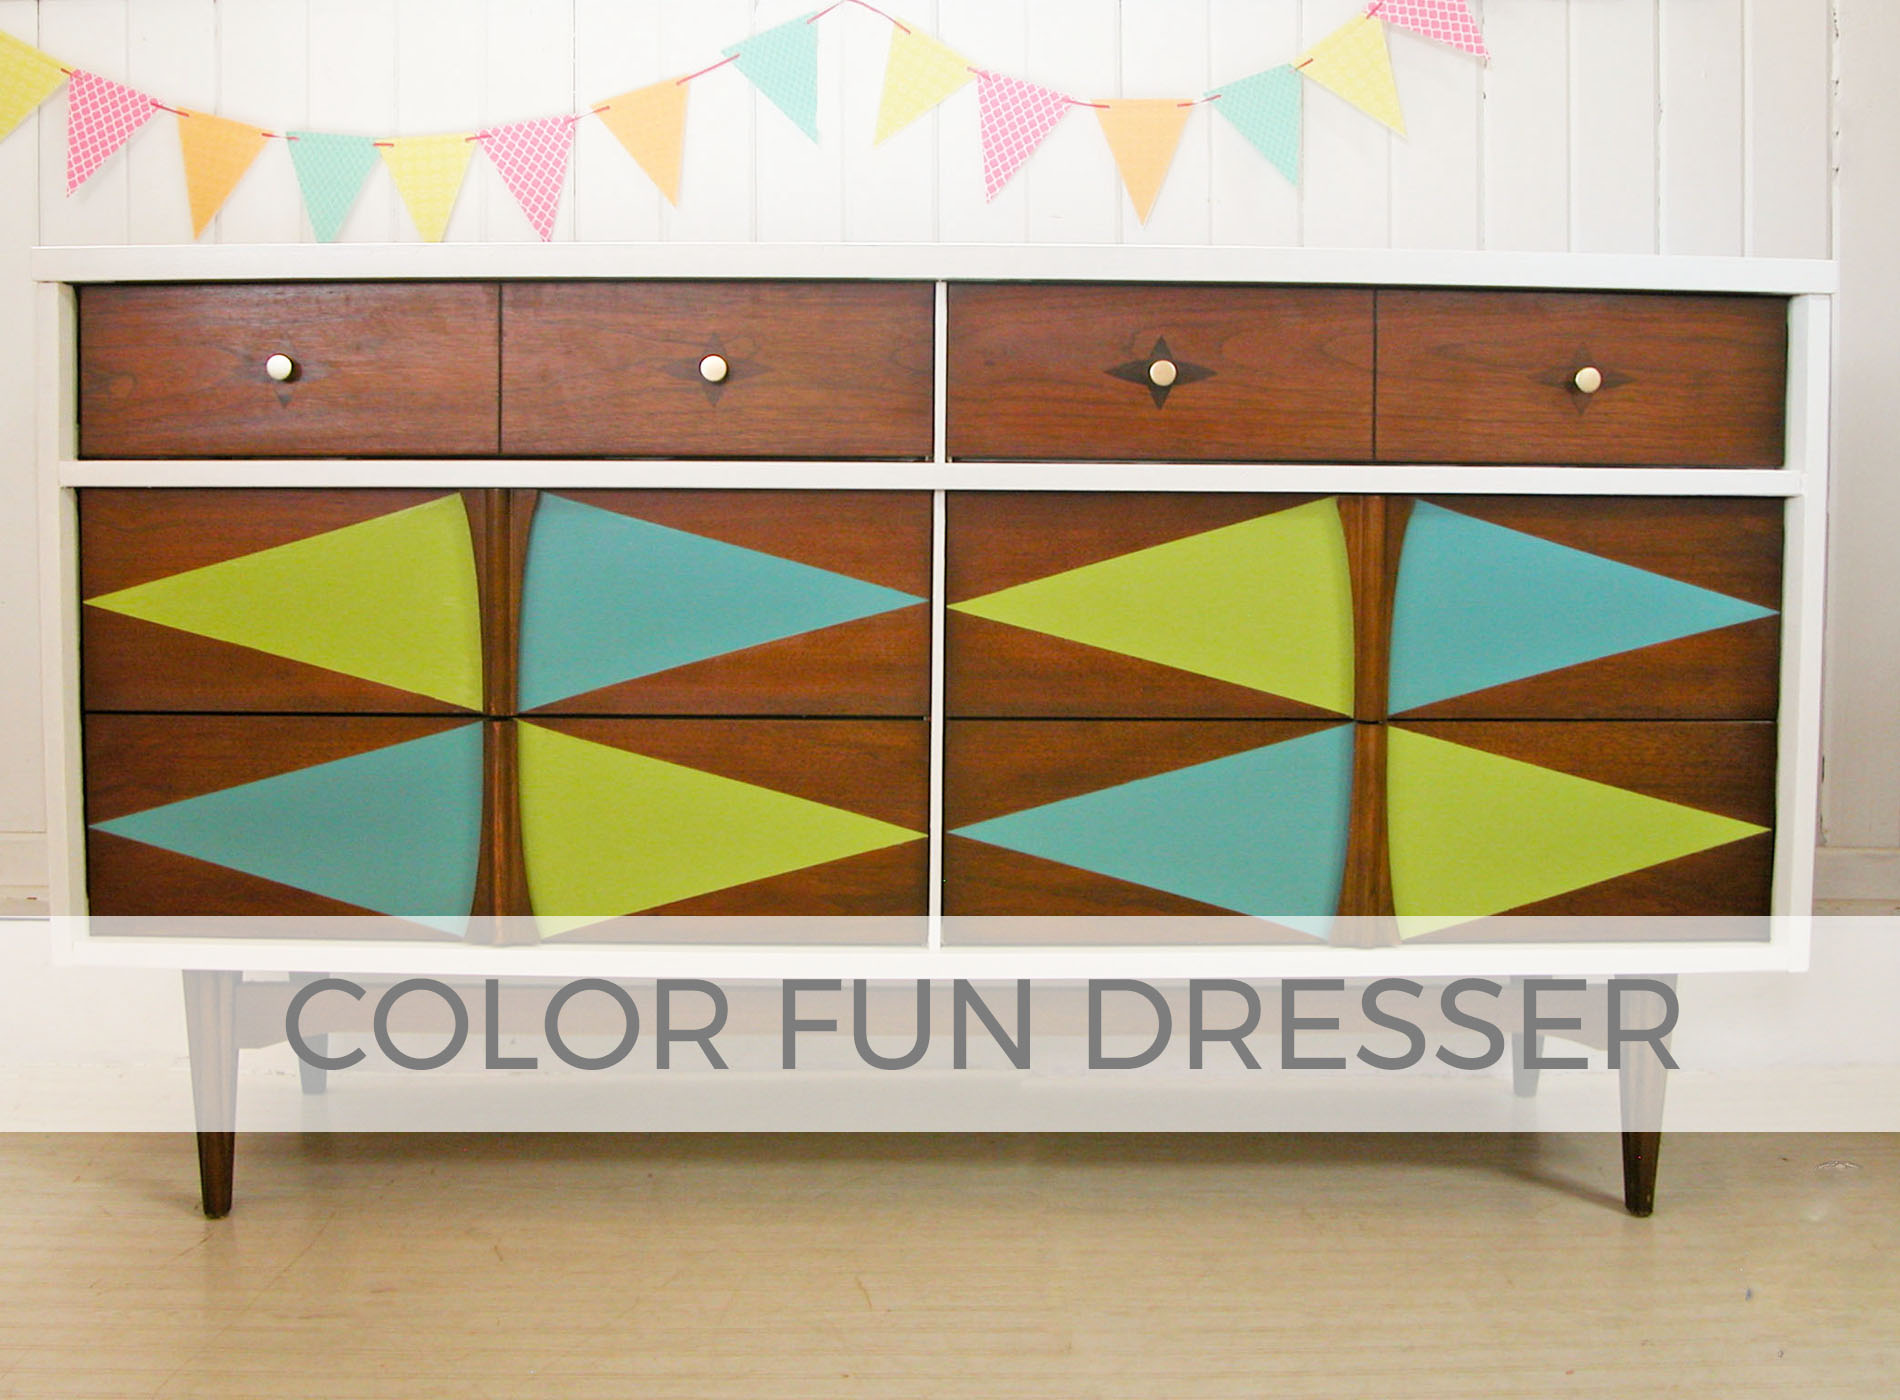 Color Fun Mid Century Modern Dresser by Larissa of Prodigal Pieces | prodigalpieces.com